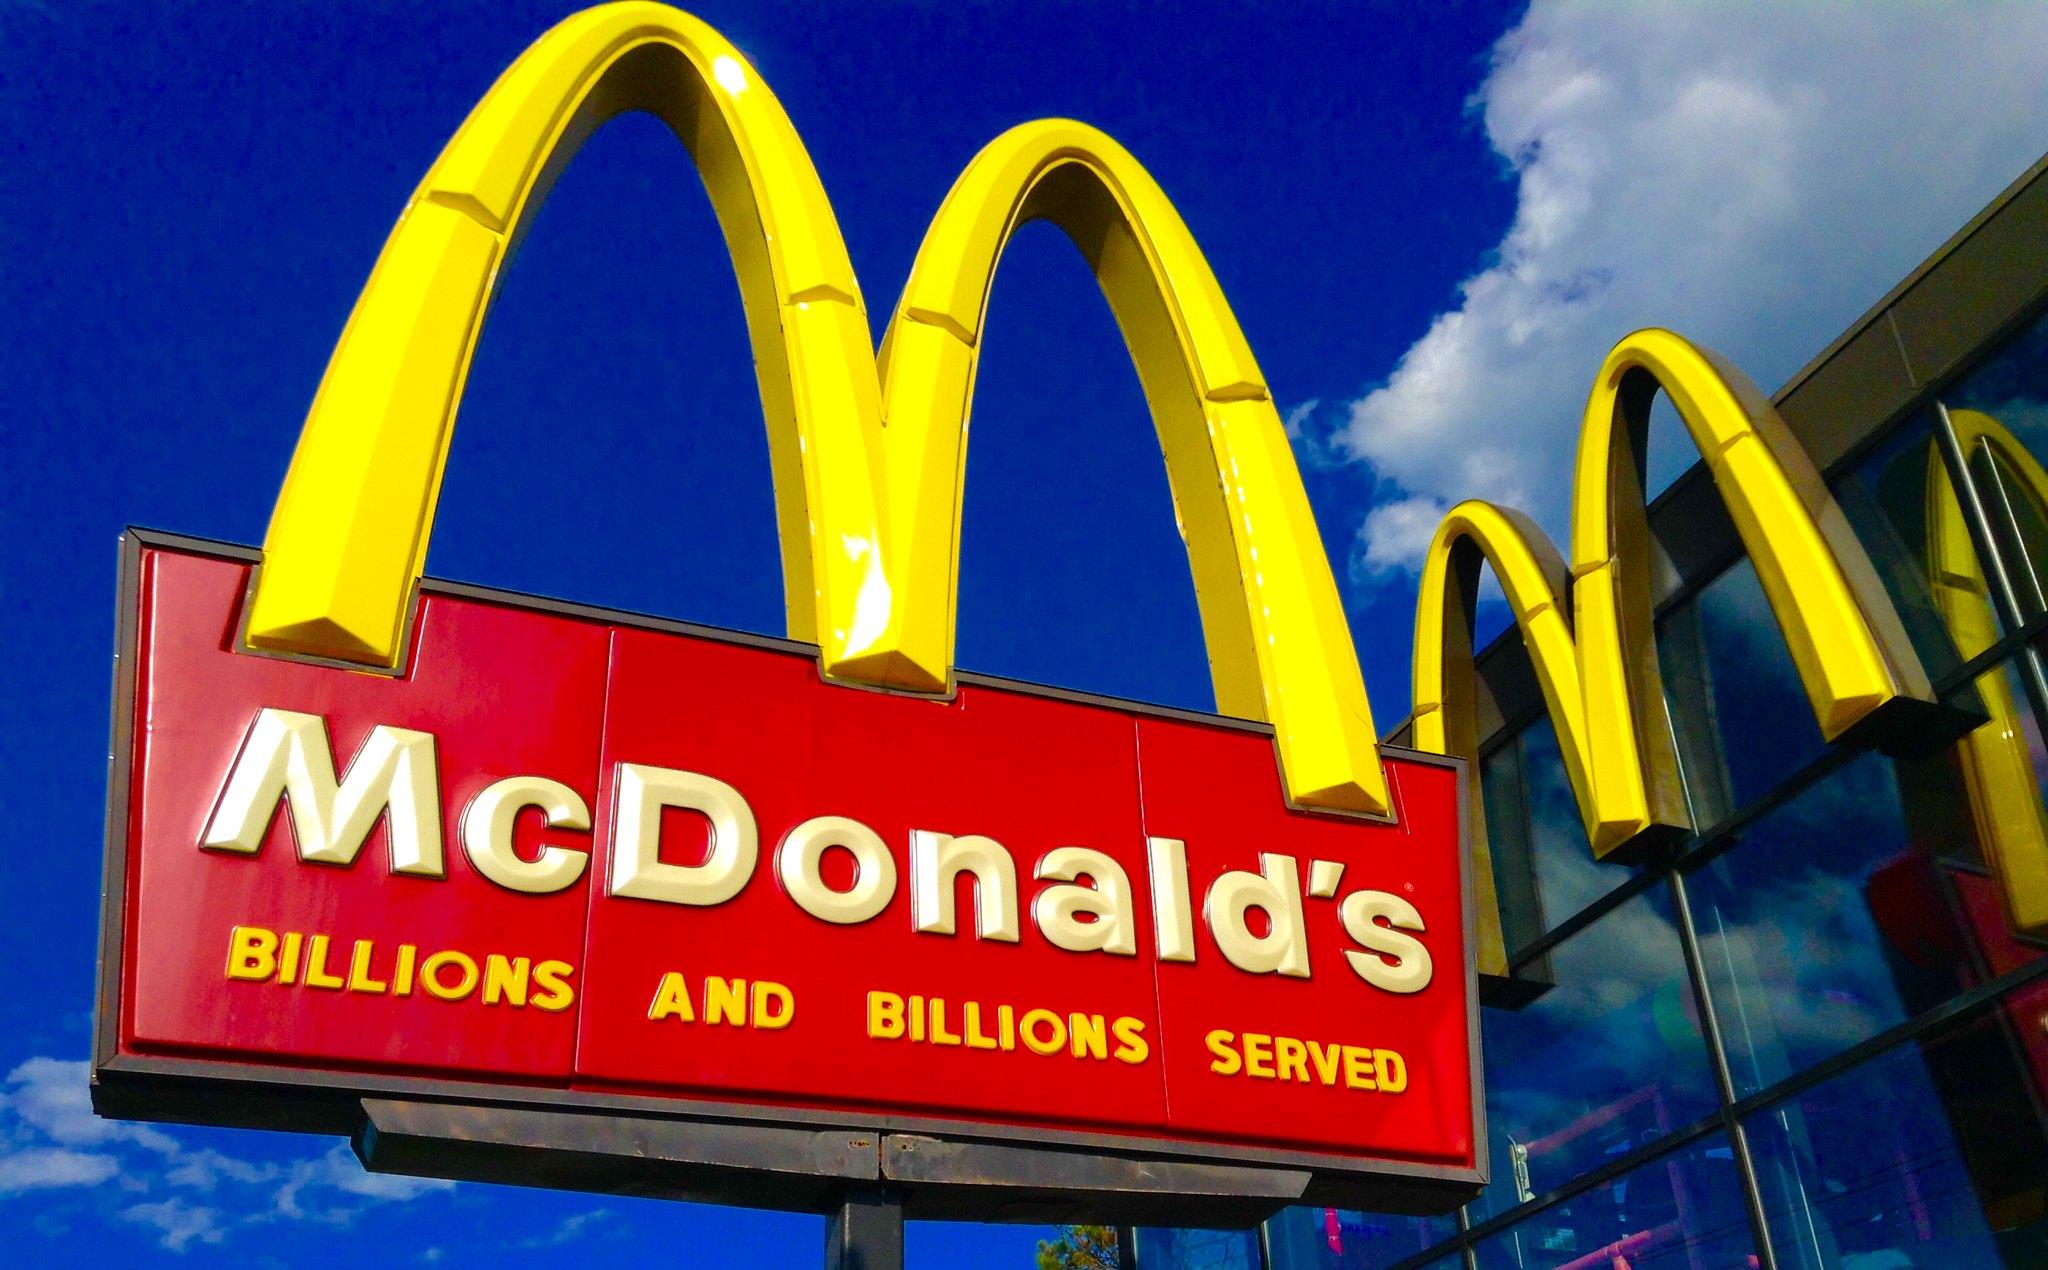 McDonalds Combats Global Poverty